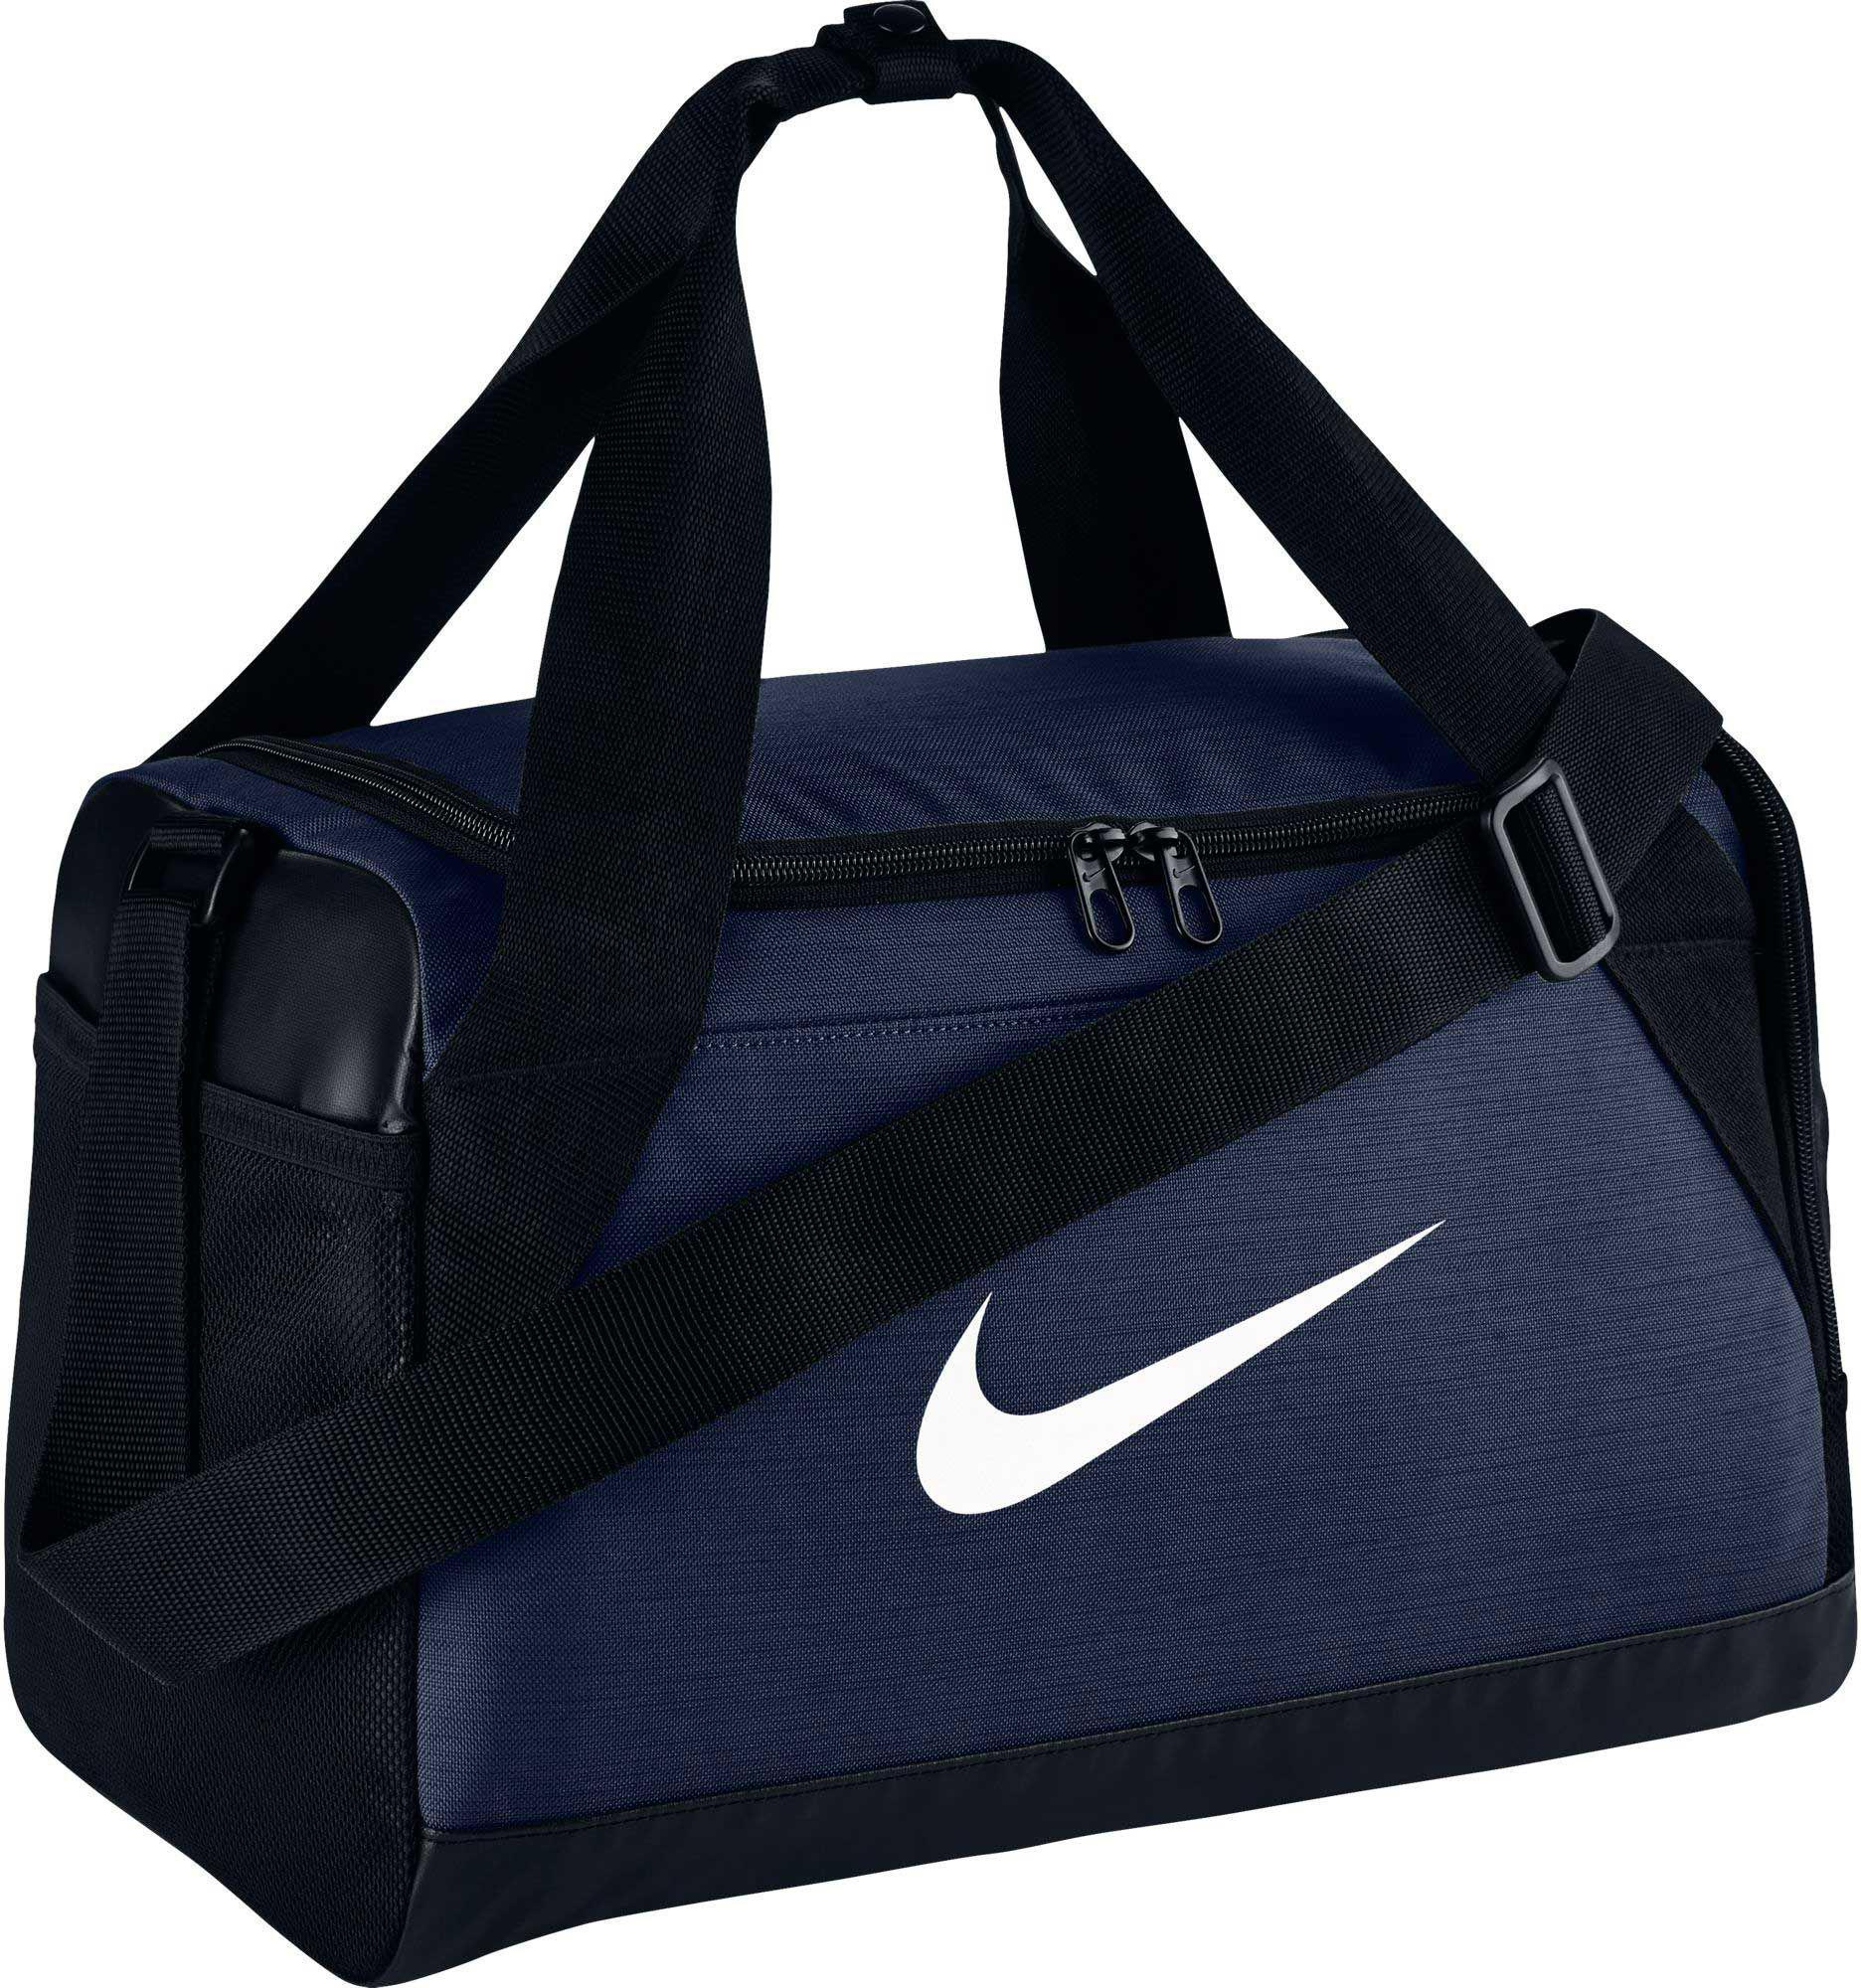 acea6614 Lyst - Nike Rasilia 8 X-small Duffle Bag in Blue for Men